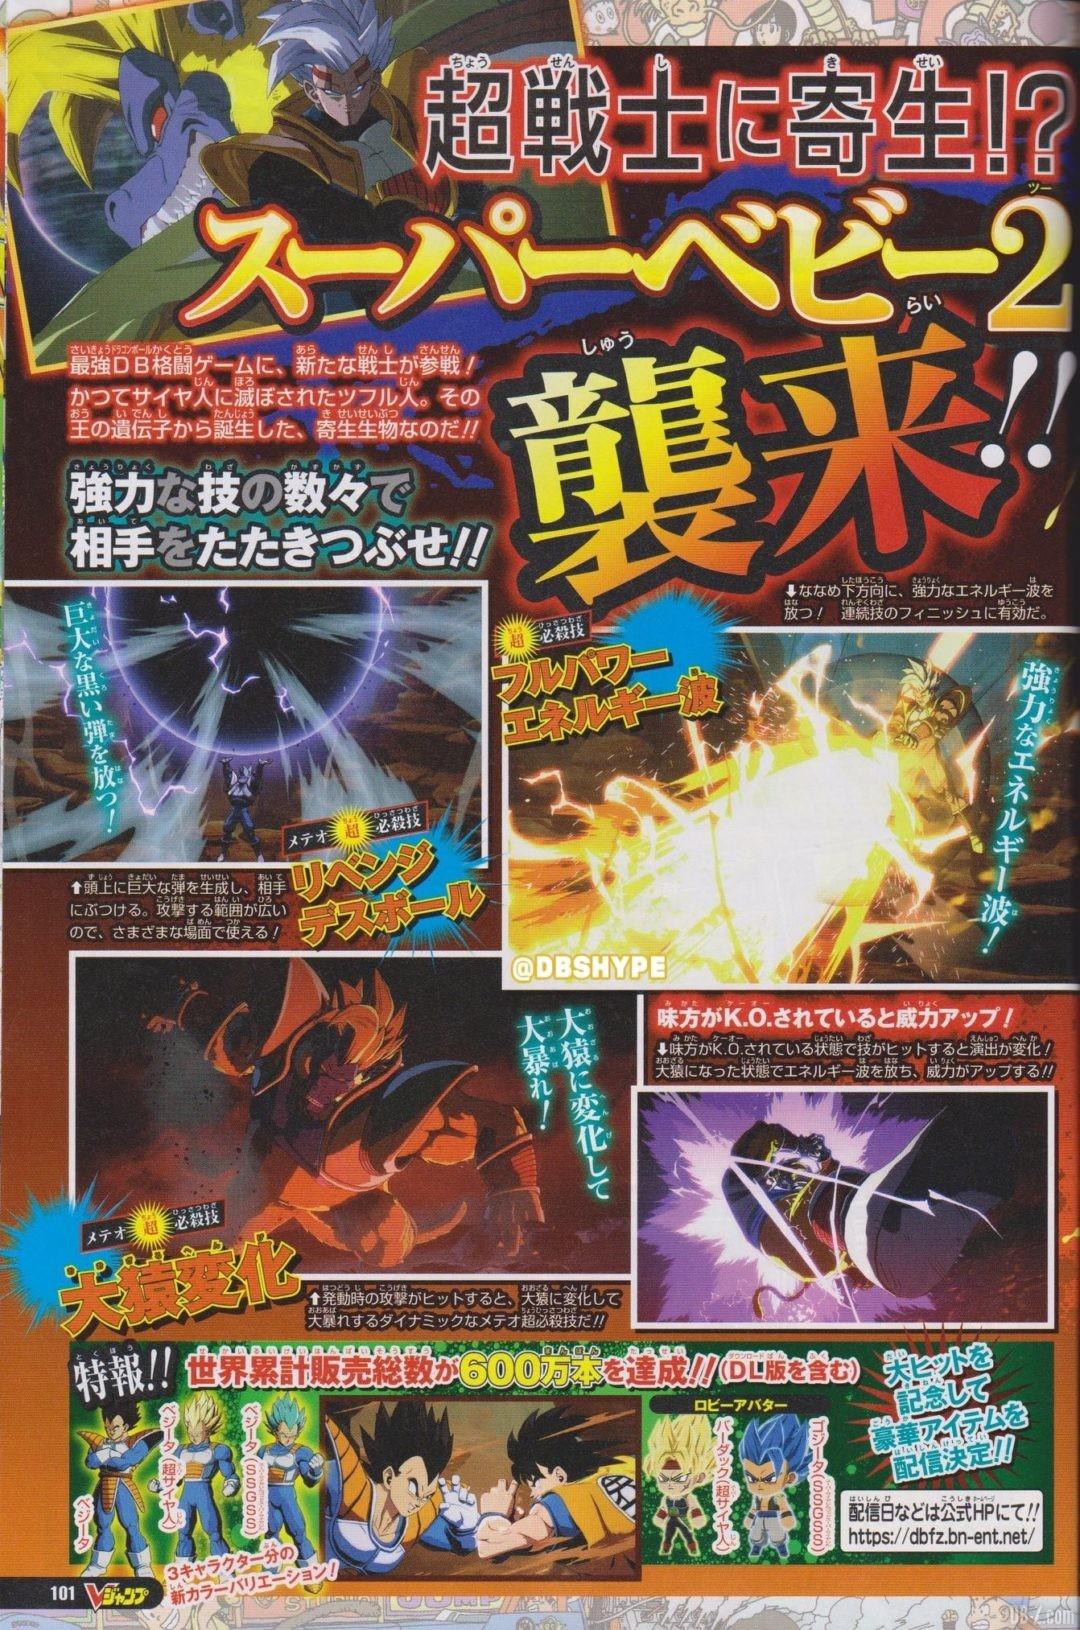 V Jump 21.12.2020 Dragon Ball FighterZ Super Baby 2 1